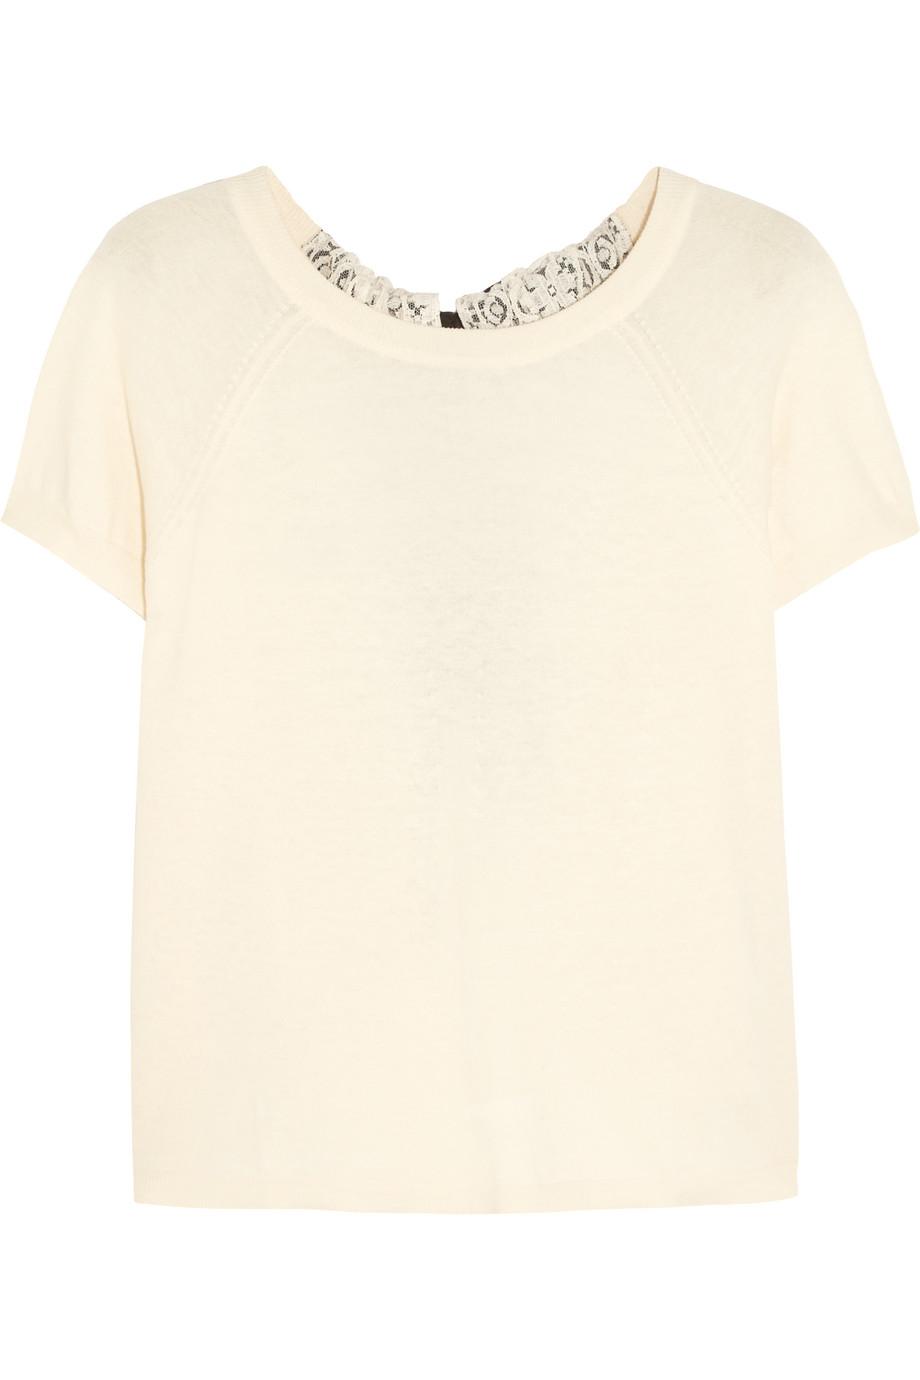 Redvalentino Chantilly Lace-Paneled Cotton and Modal-Blend Sweater, Cream, Women's, Size: XXS